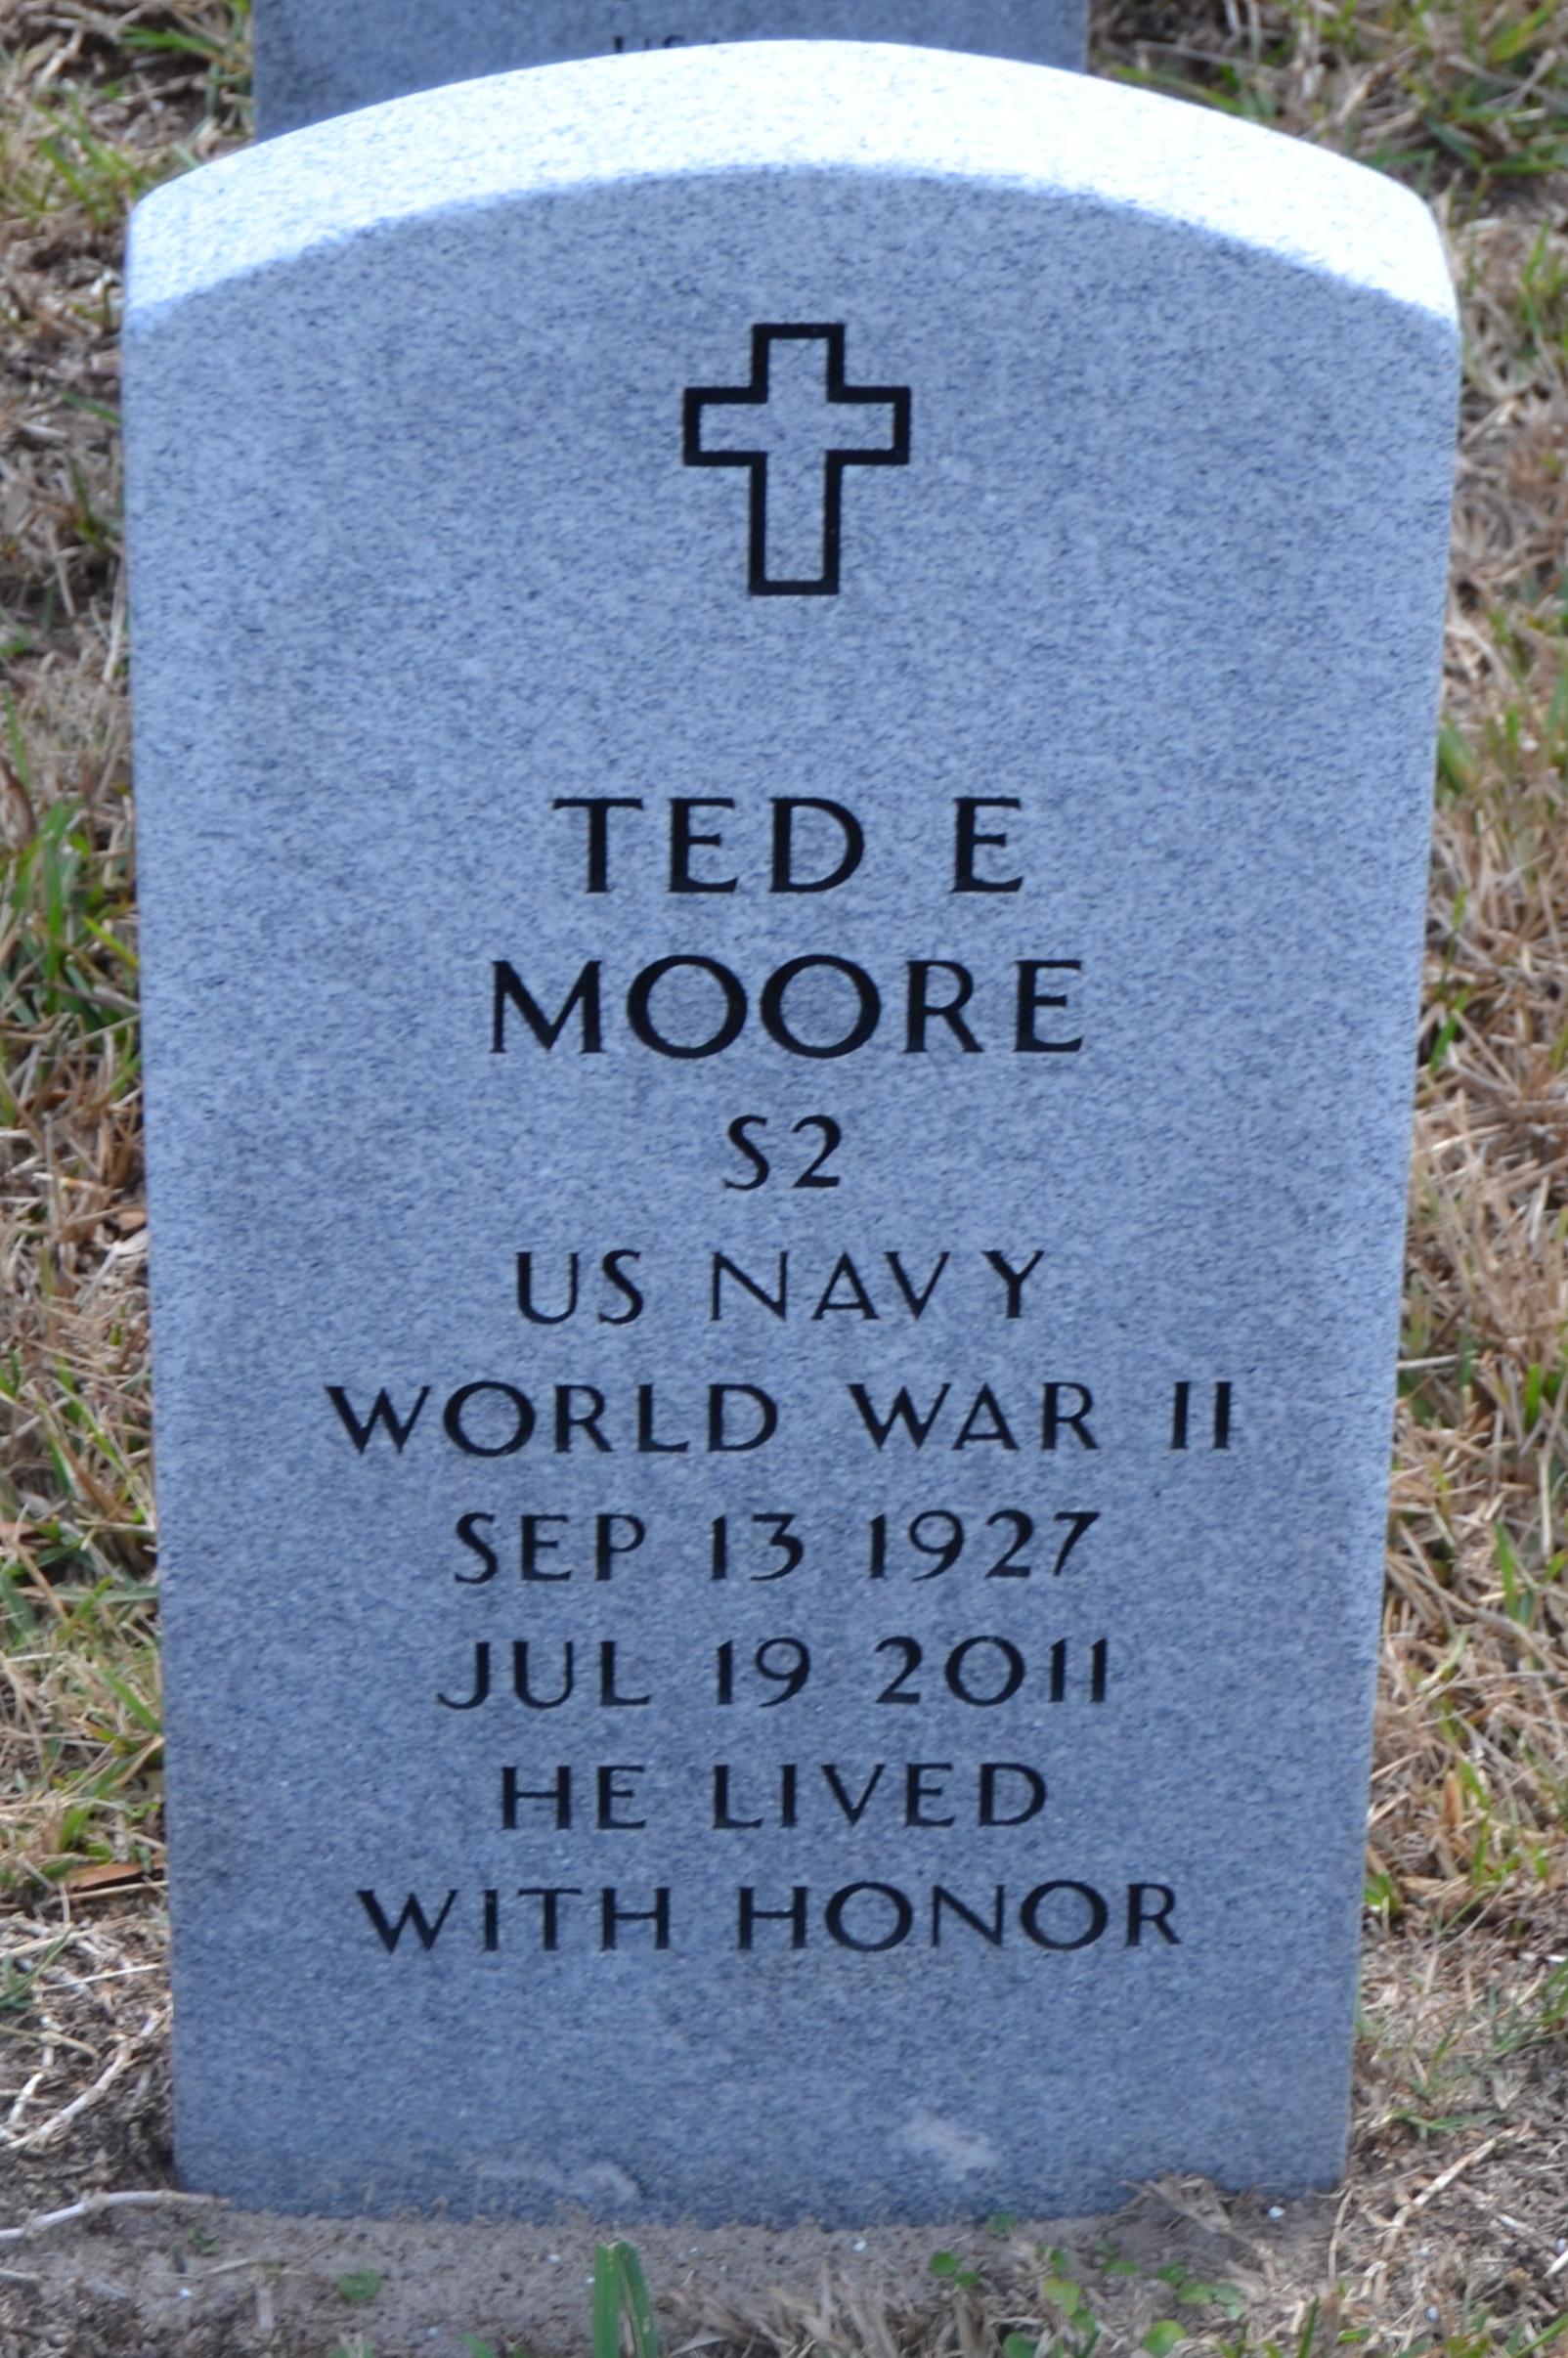 Ted E. Moore